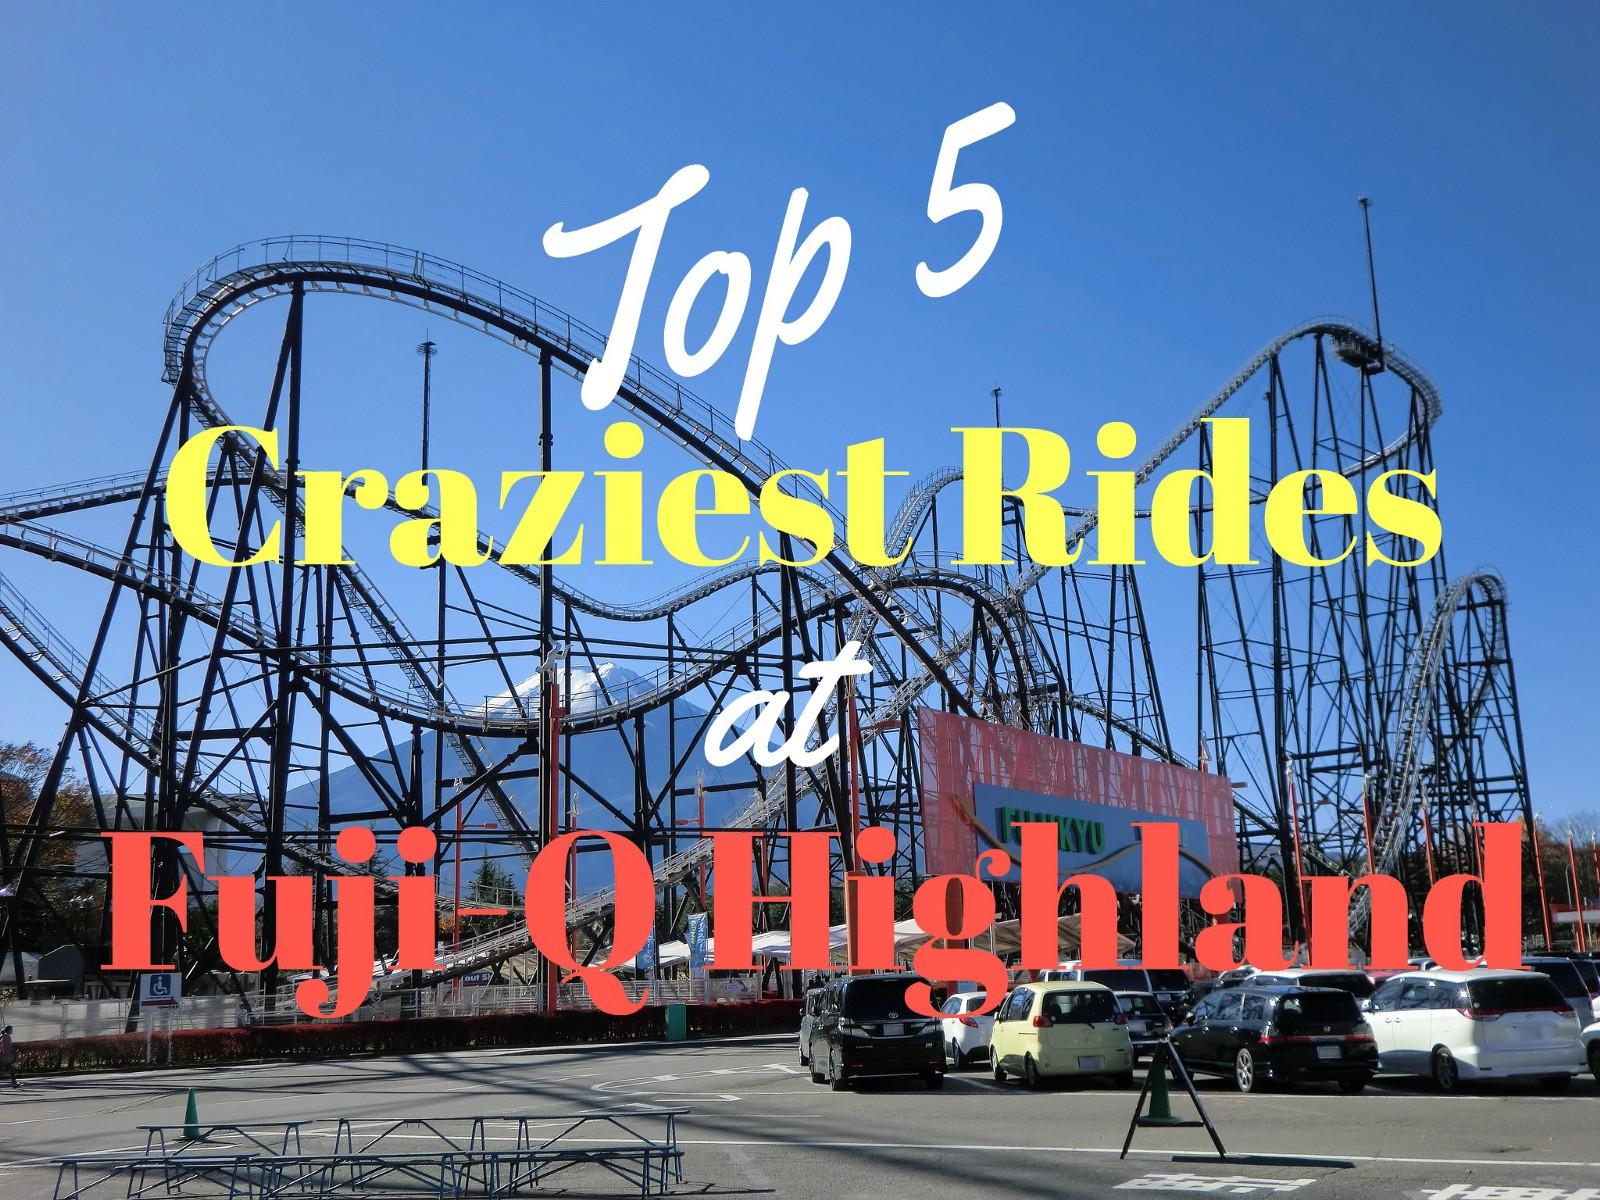 5 Craziest Rides at Fuji-Q Highland - Japan Web Magazine